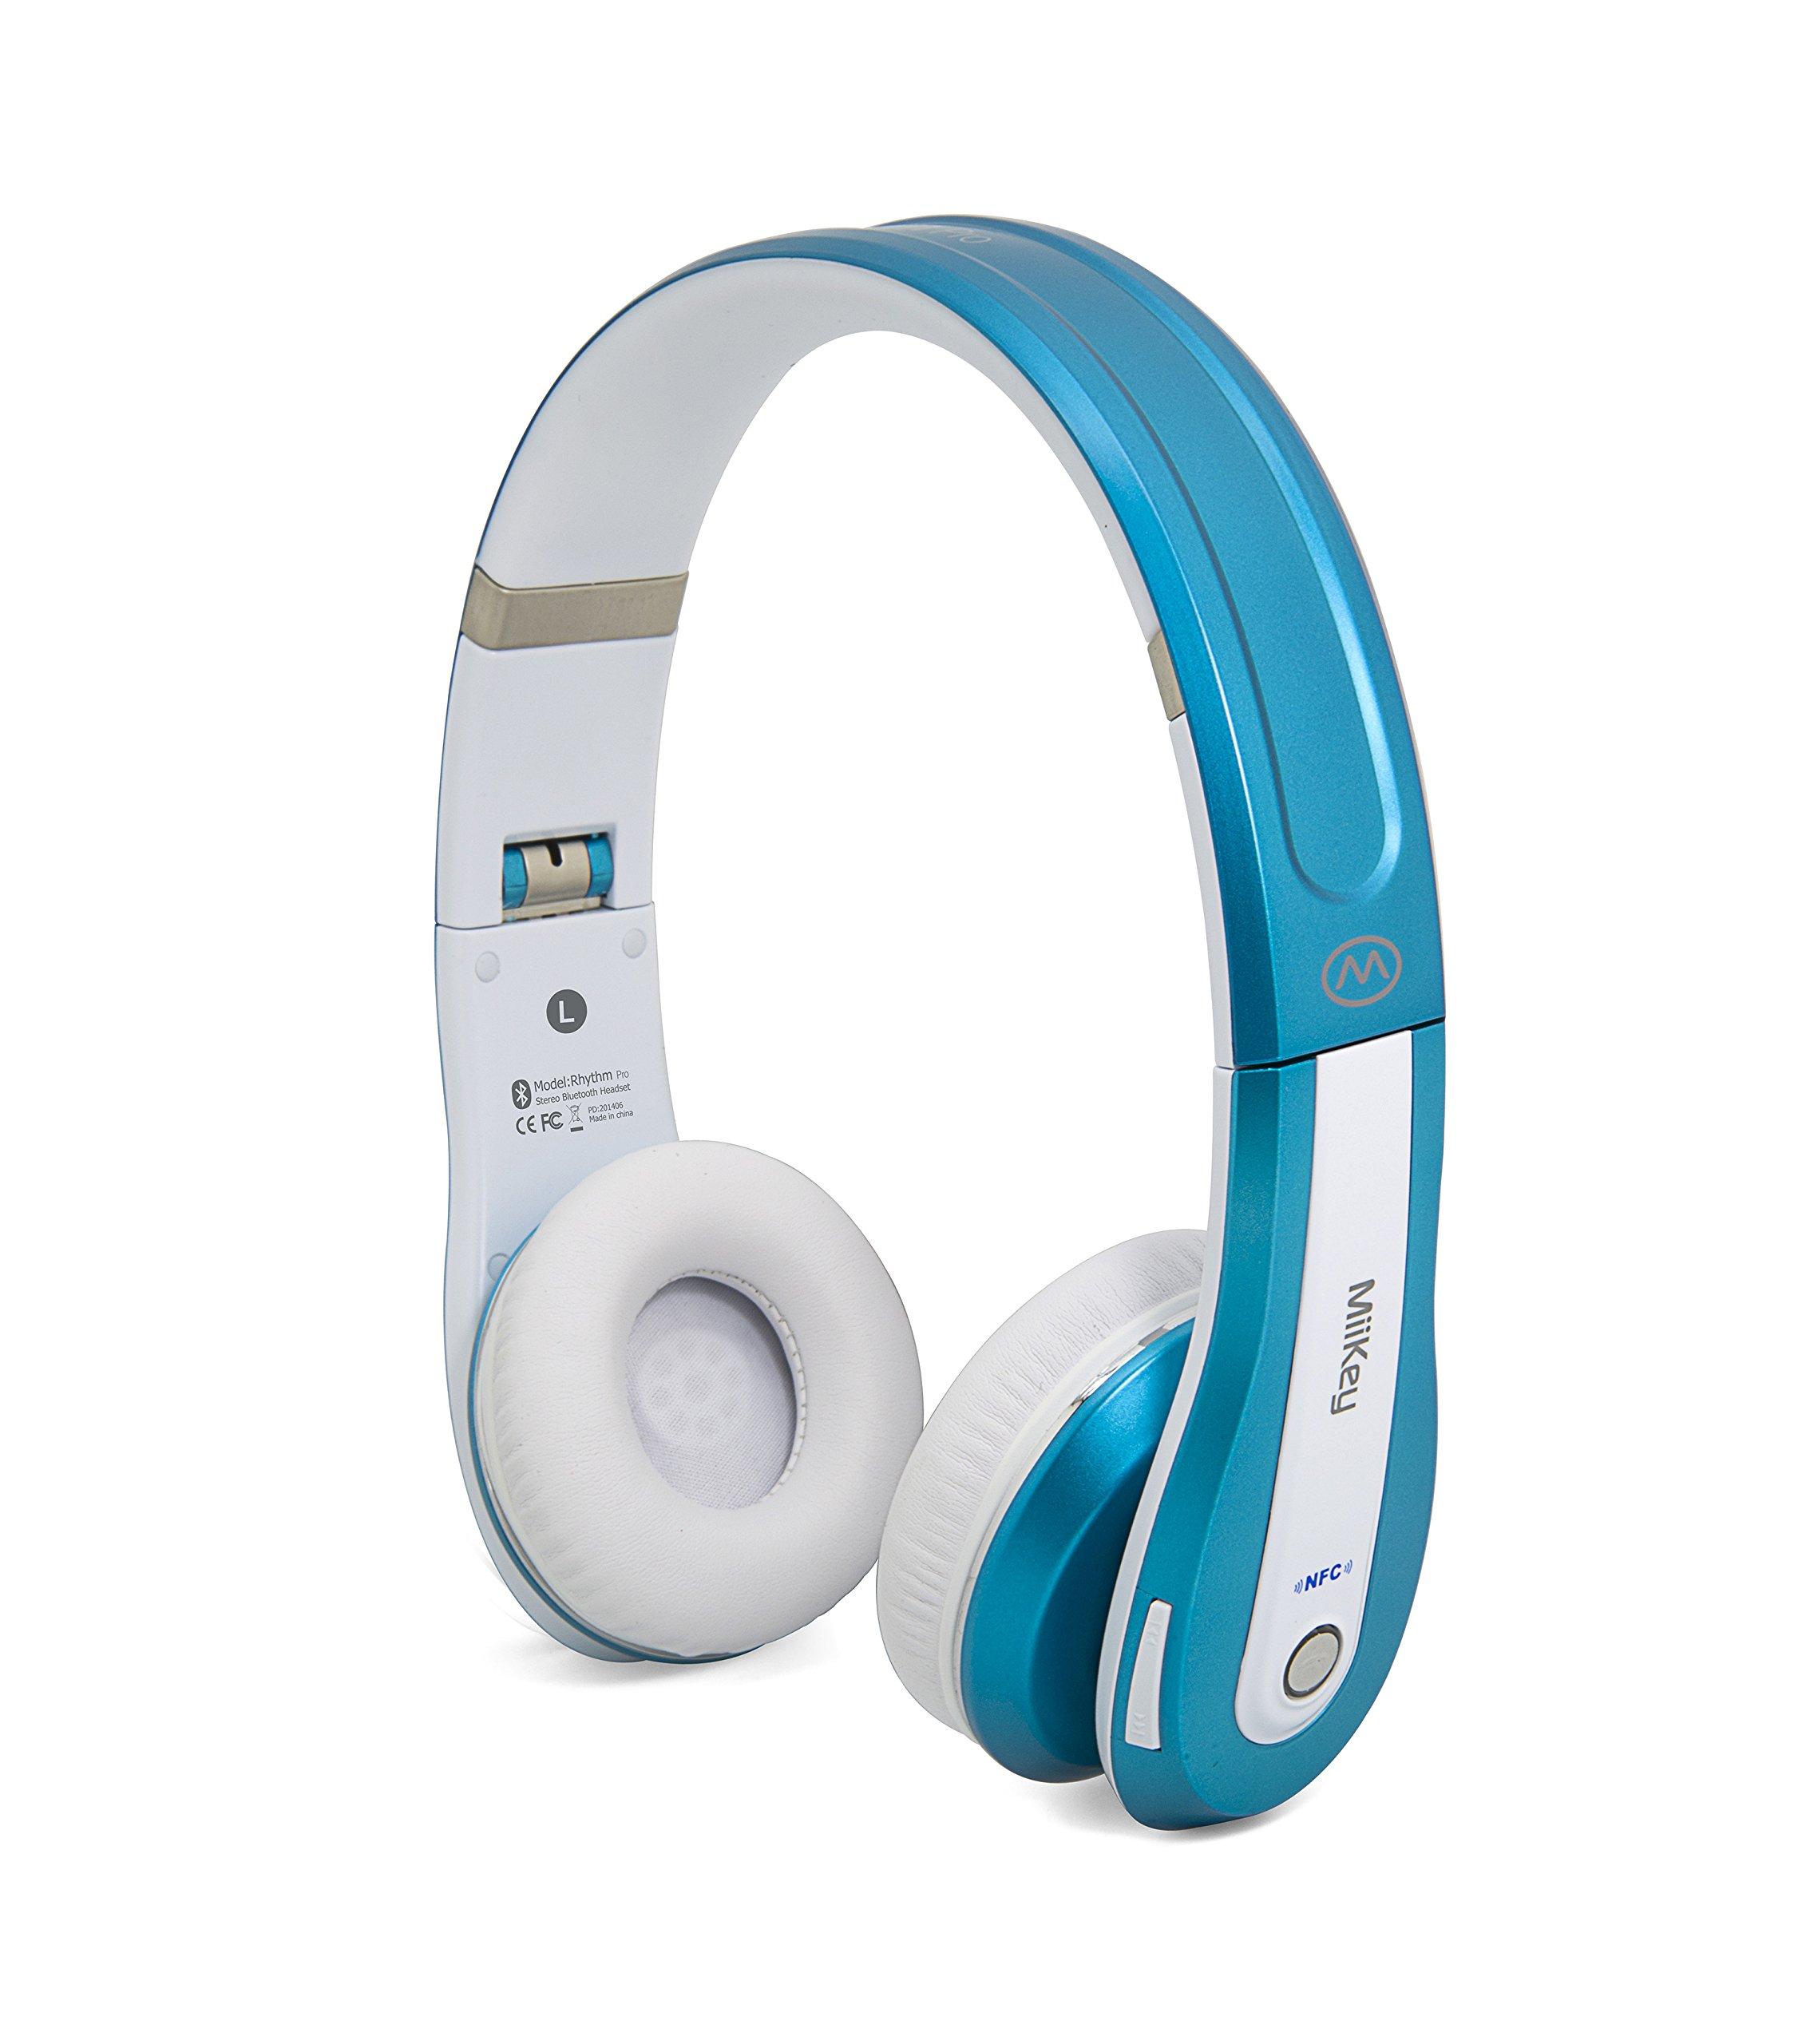 MiiKey Rhythm Pro White/Blue Wireless Bluetooth 4.0,NFC,Multi-connect Headphone with Microphone & HD Audio